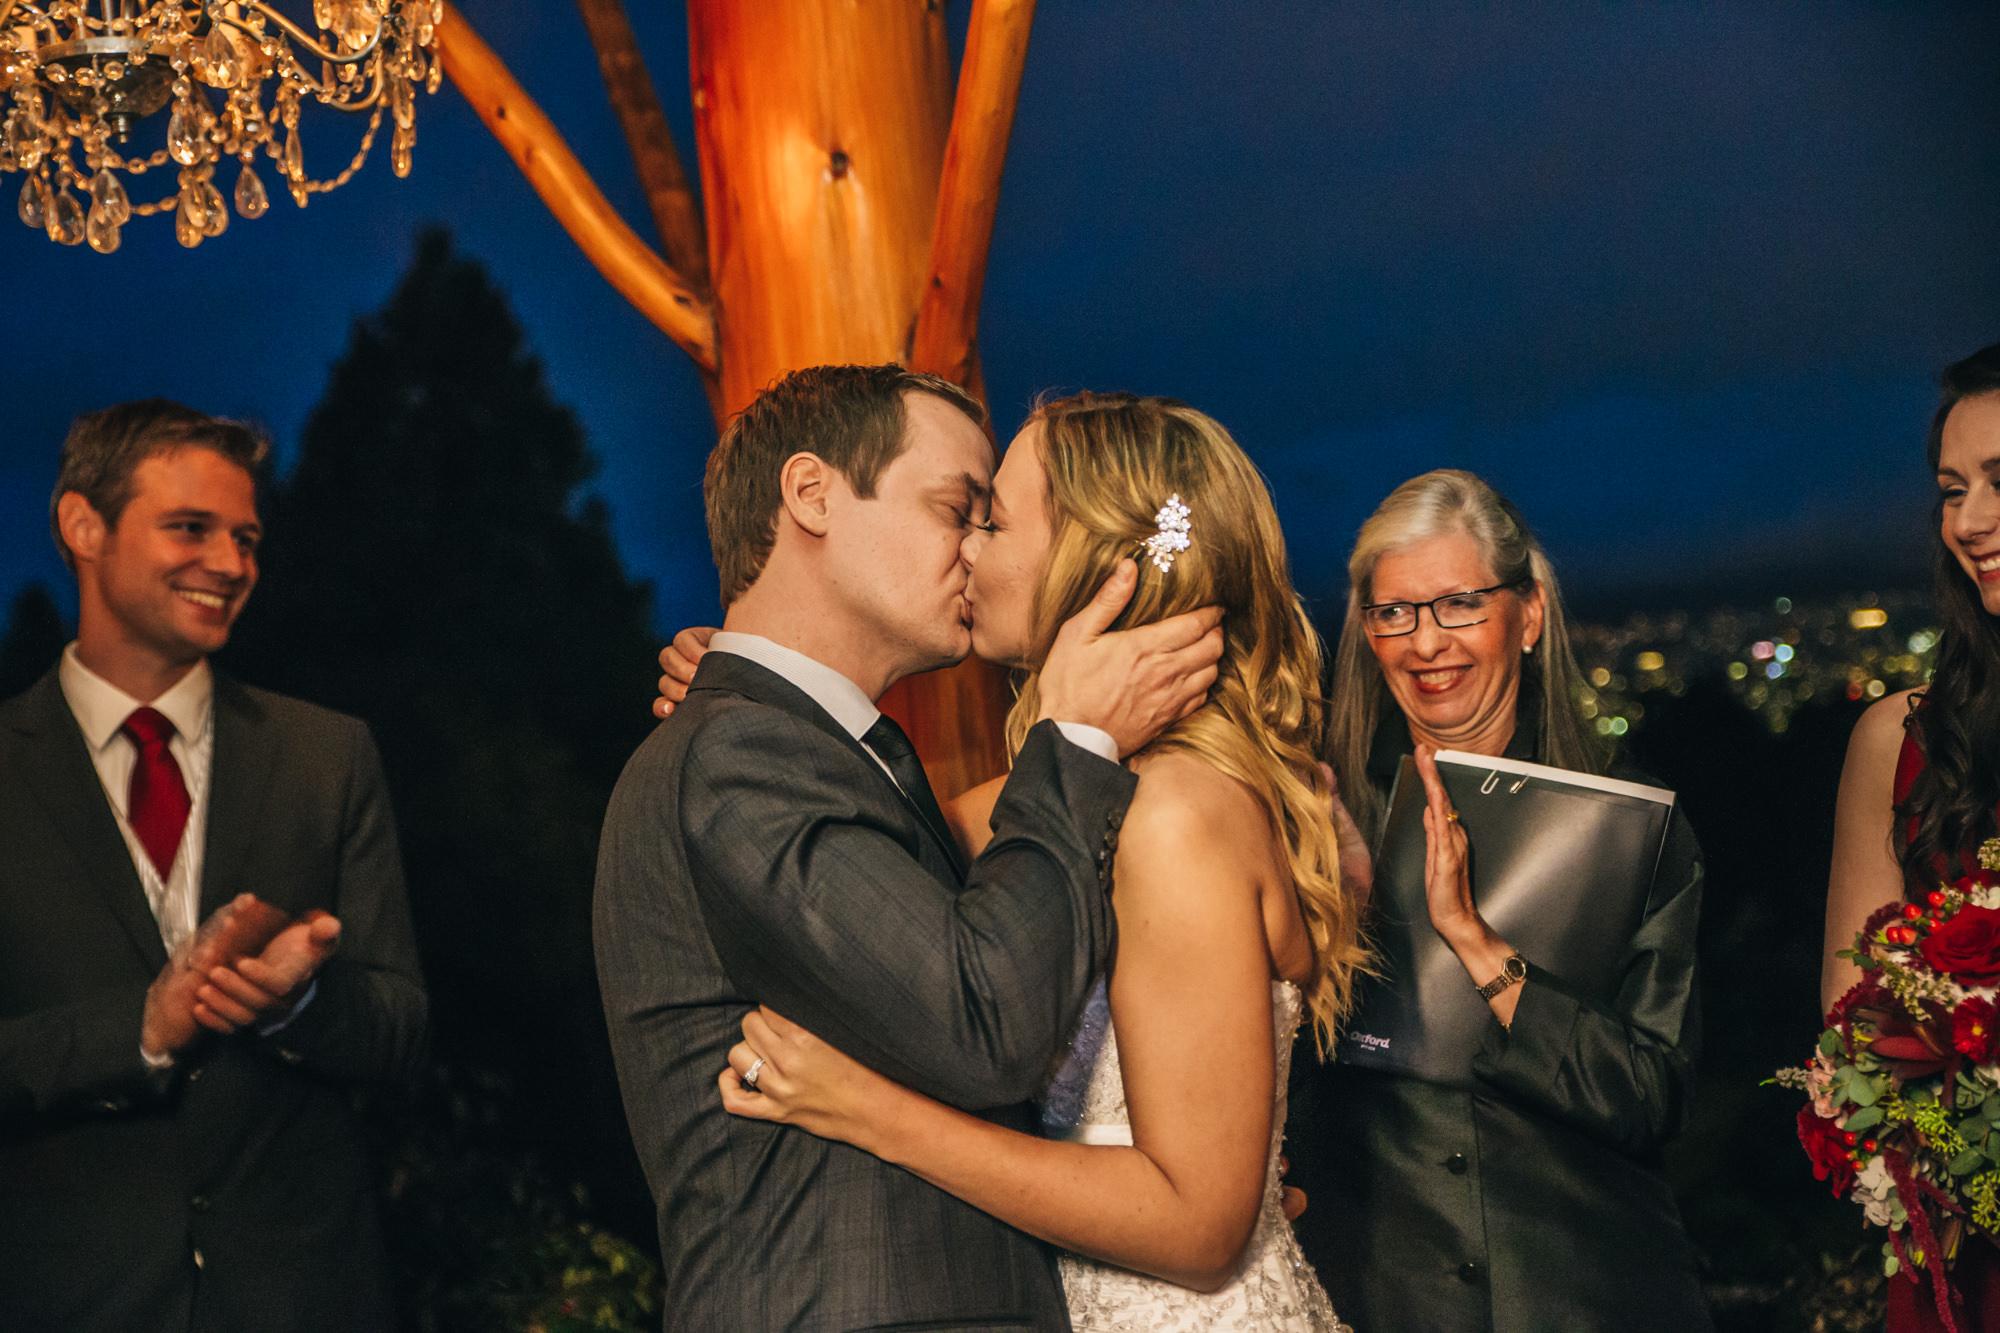 36-seasons-in-the-park-wedding-ceremony.jpg